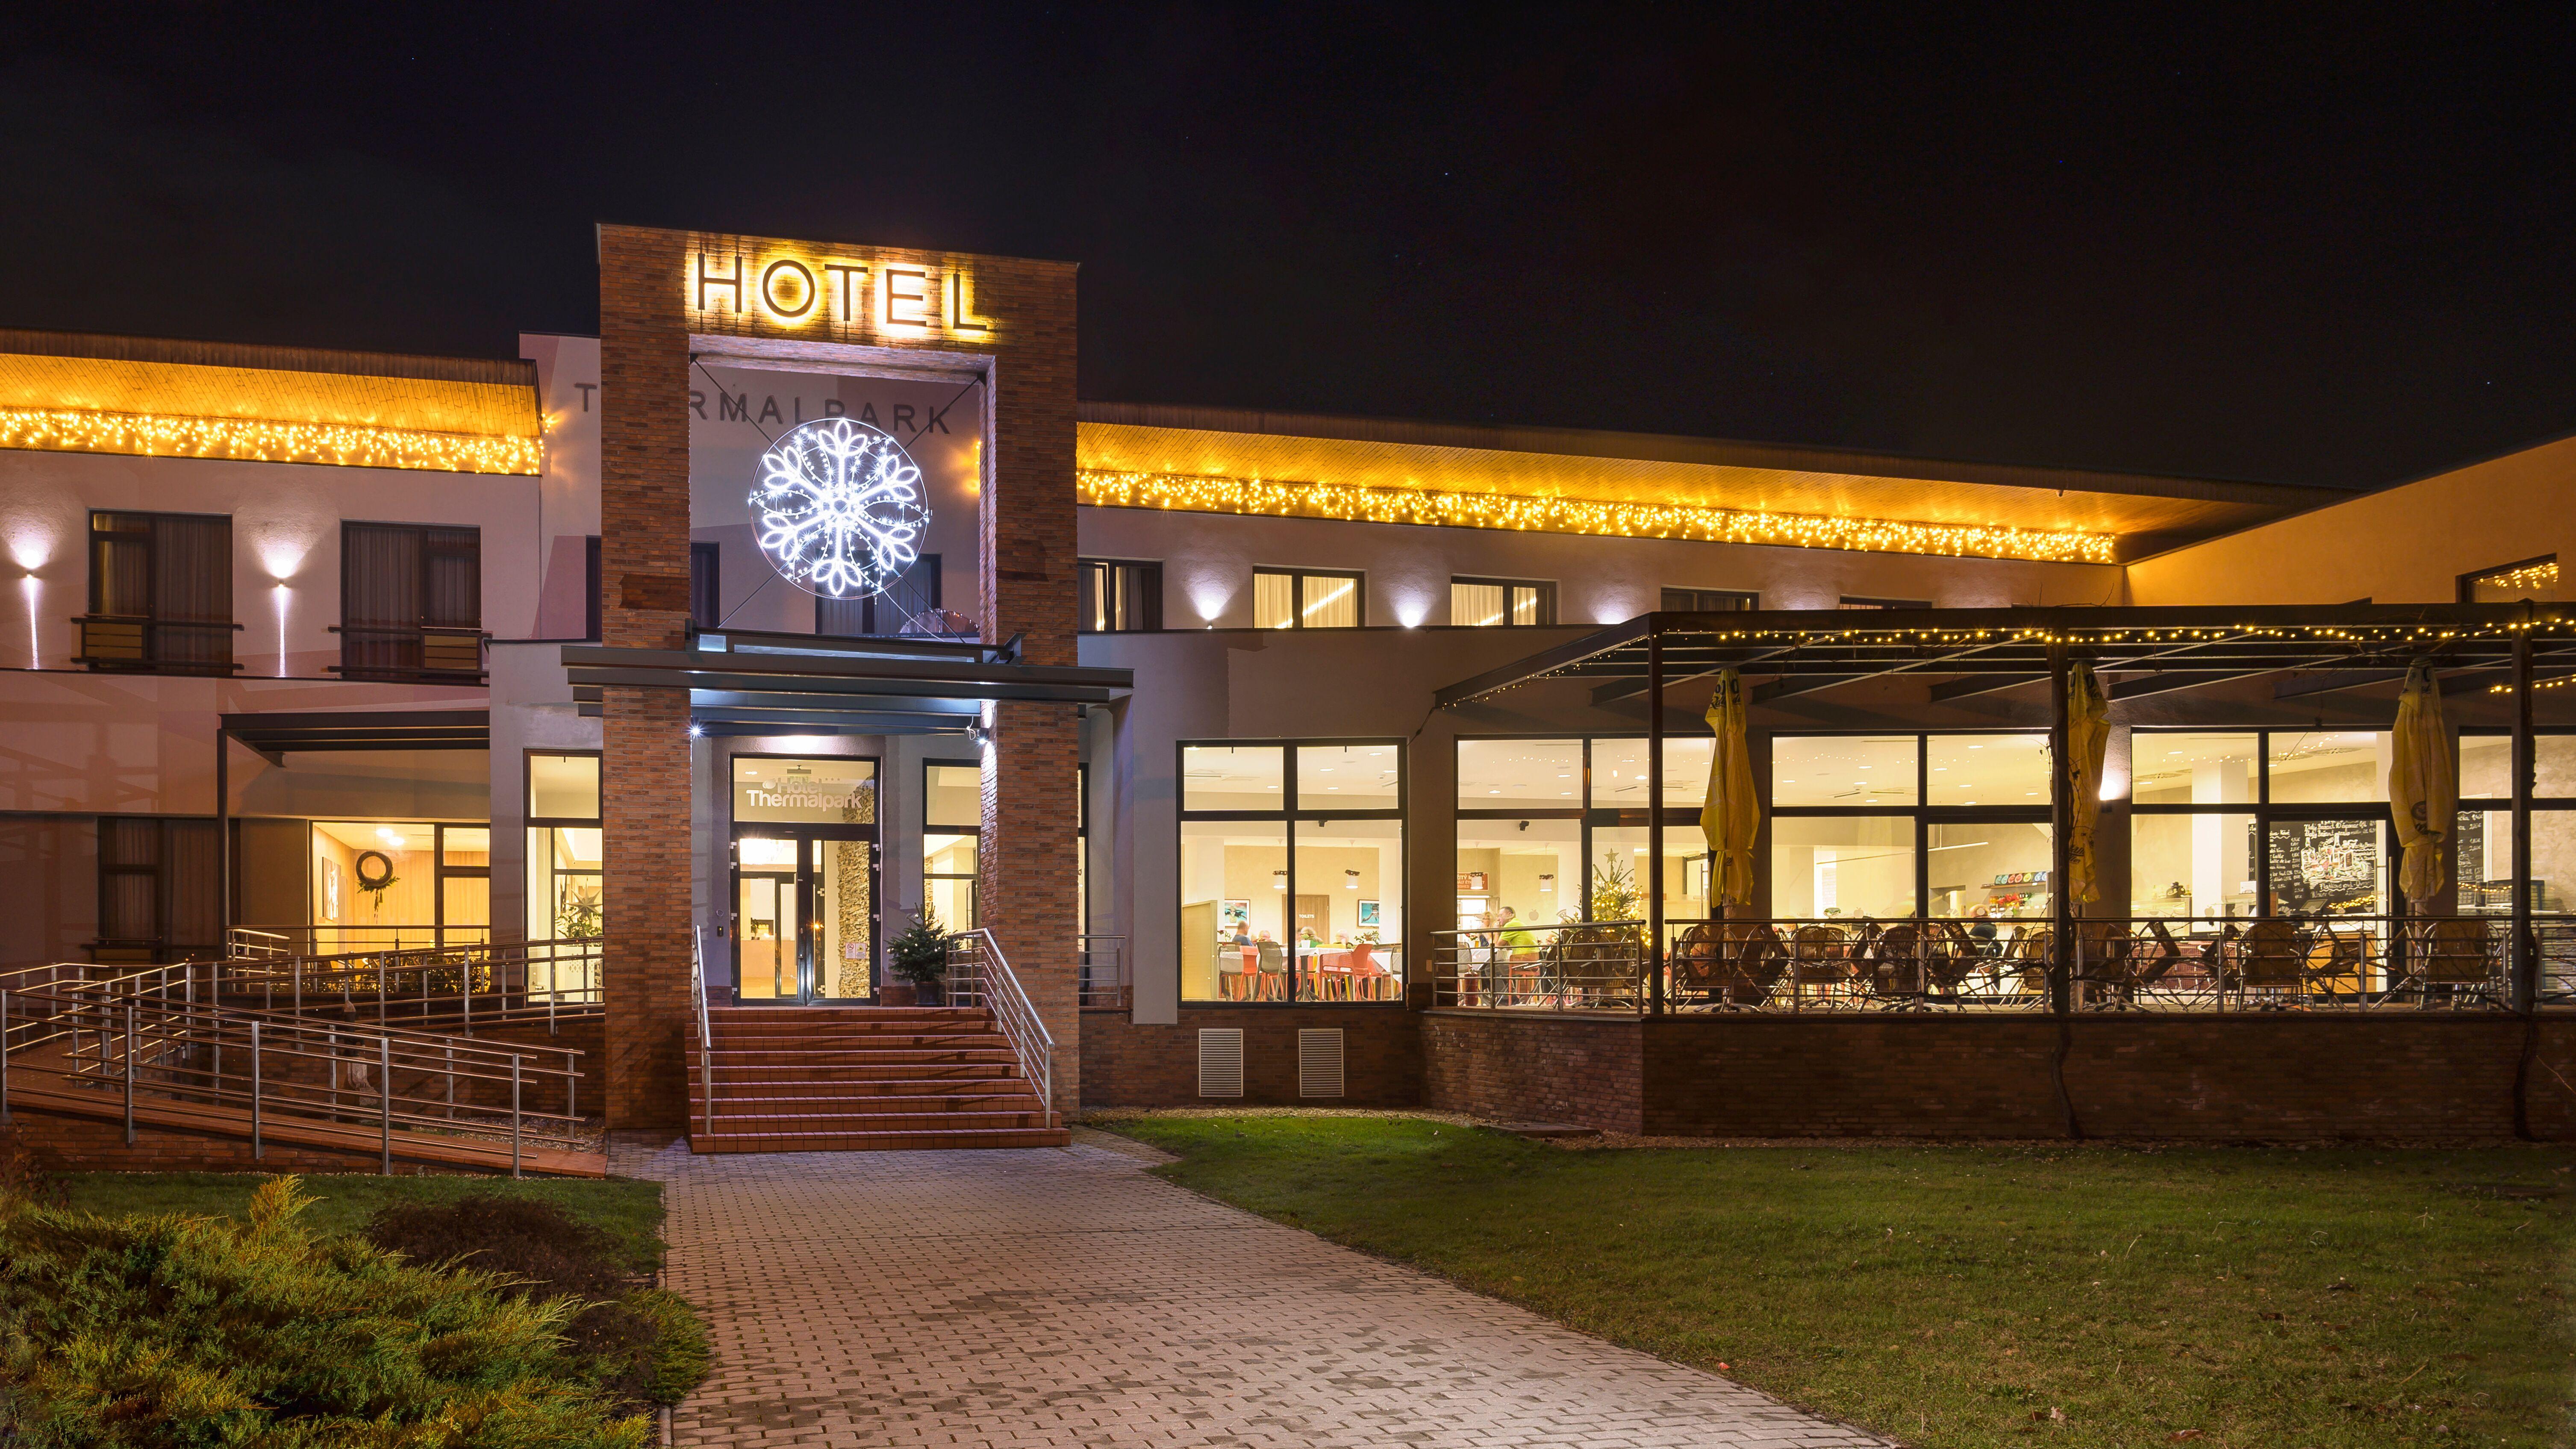 Hotel Thermalpark 2019